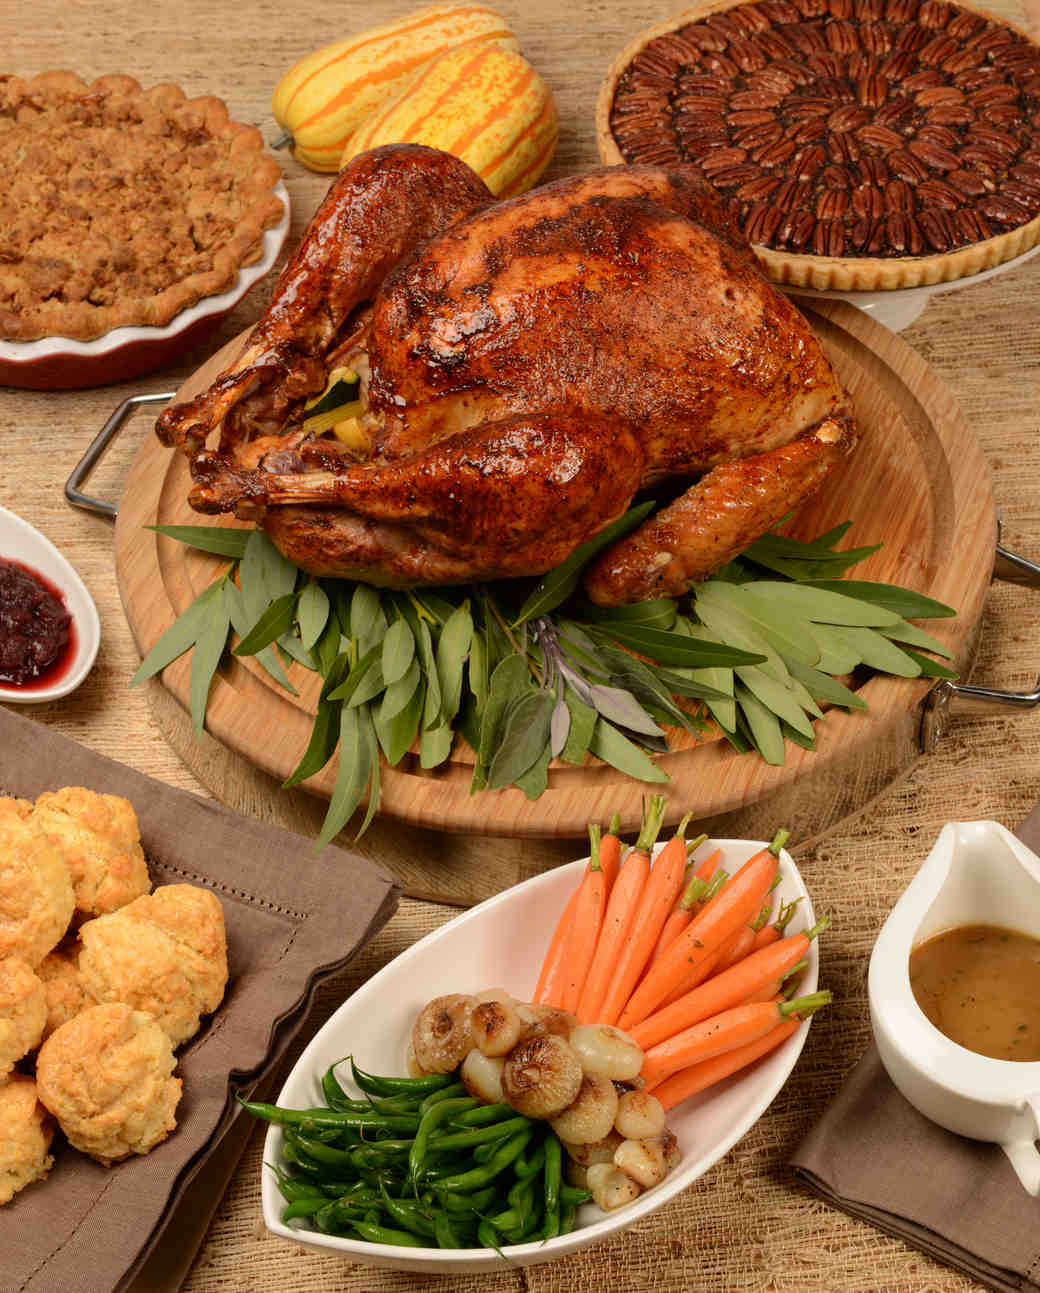 lisa-dupar-thanksgiving-menu-1116-thanksgiving-menu-1116.jpg (skyword:361675)